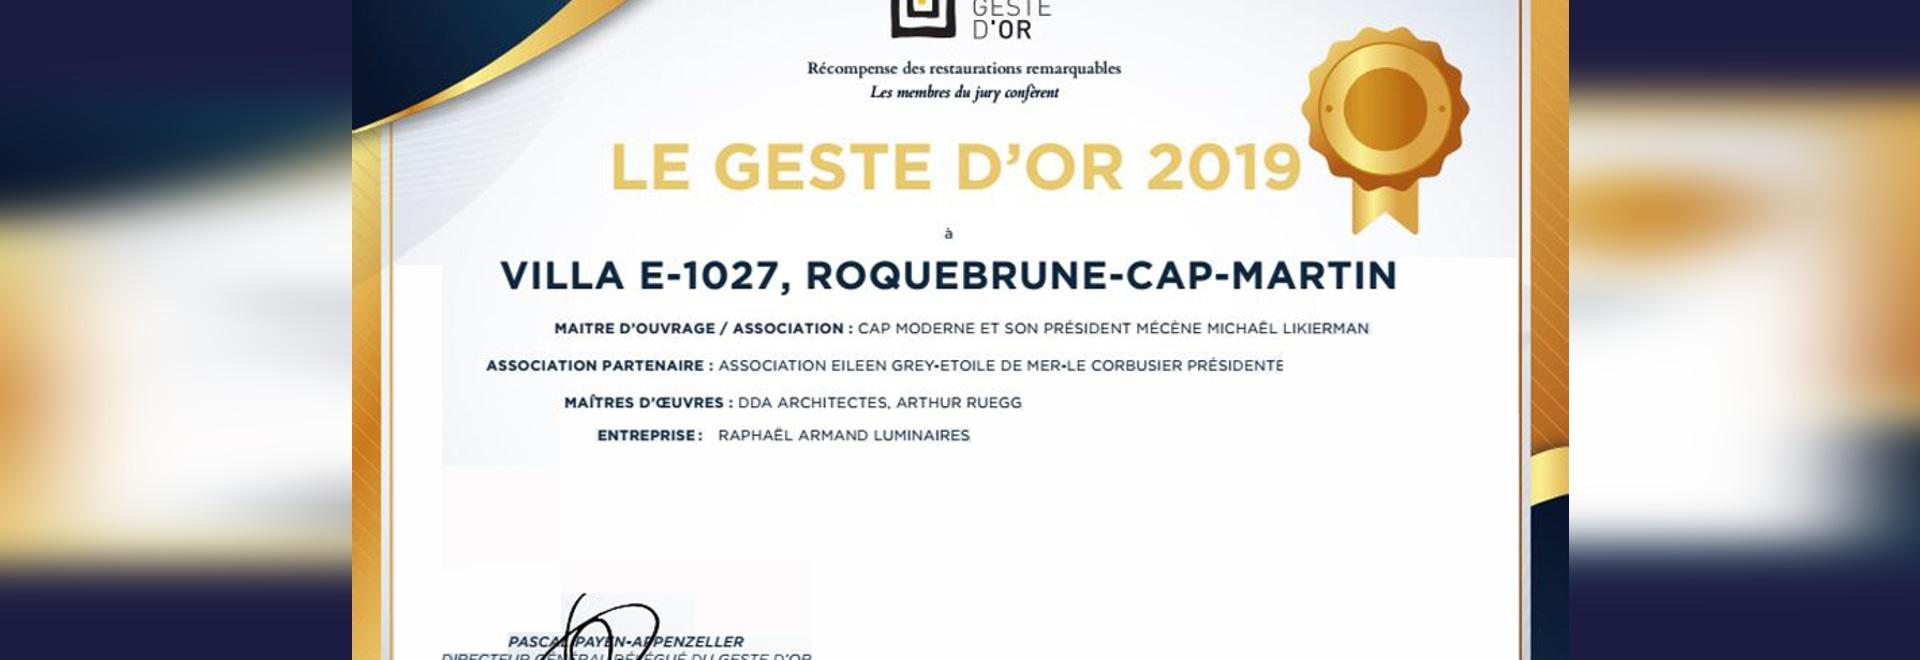 "Diplome International ""LE GESTE D'OR 2019"""